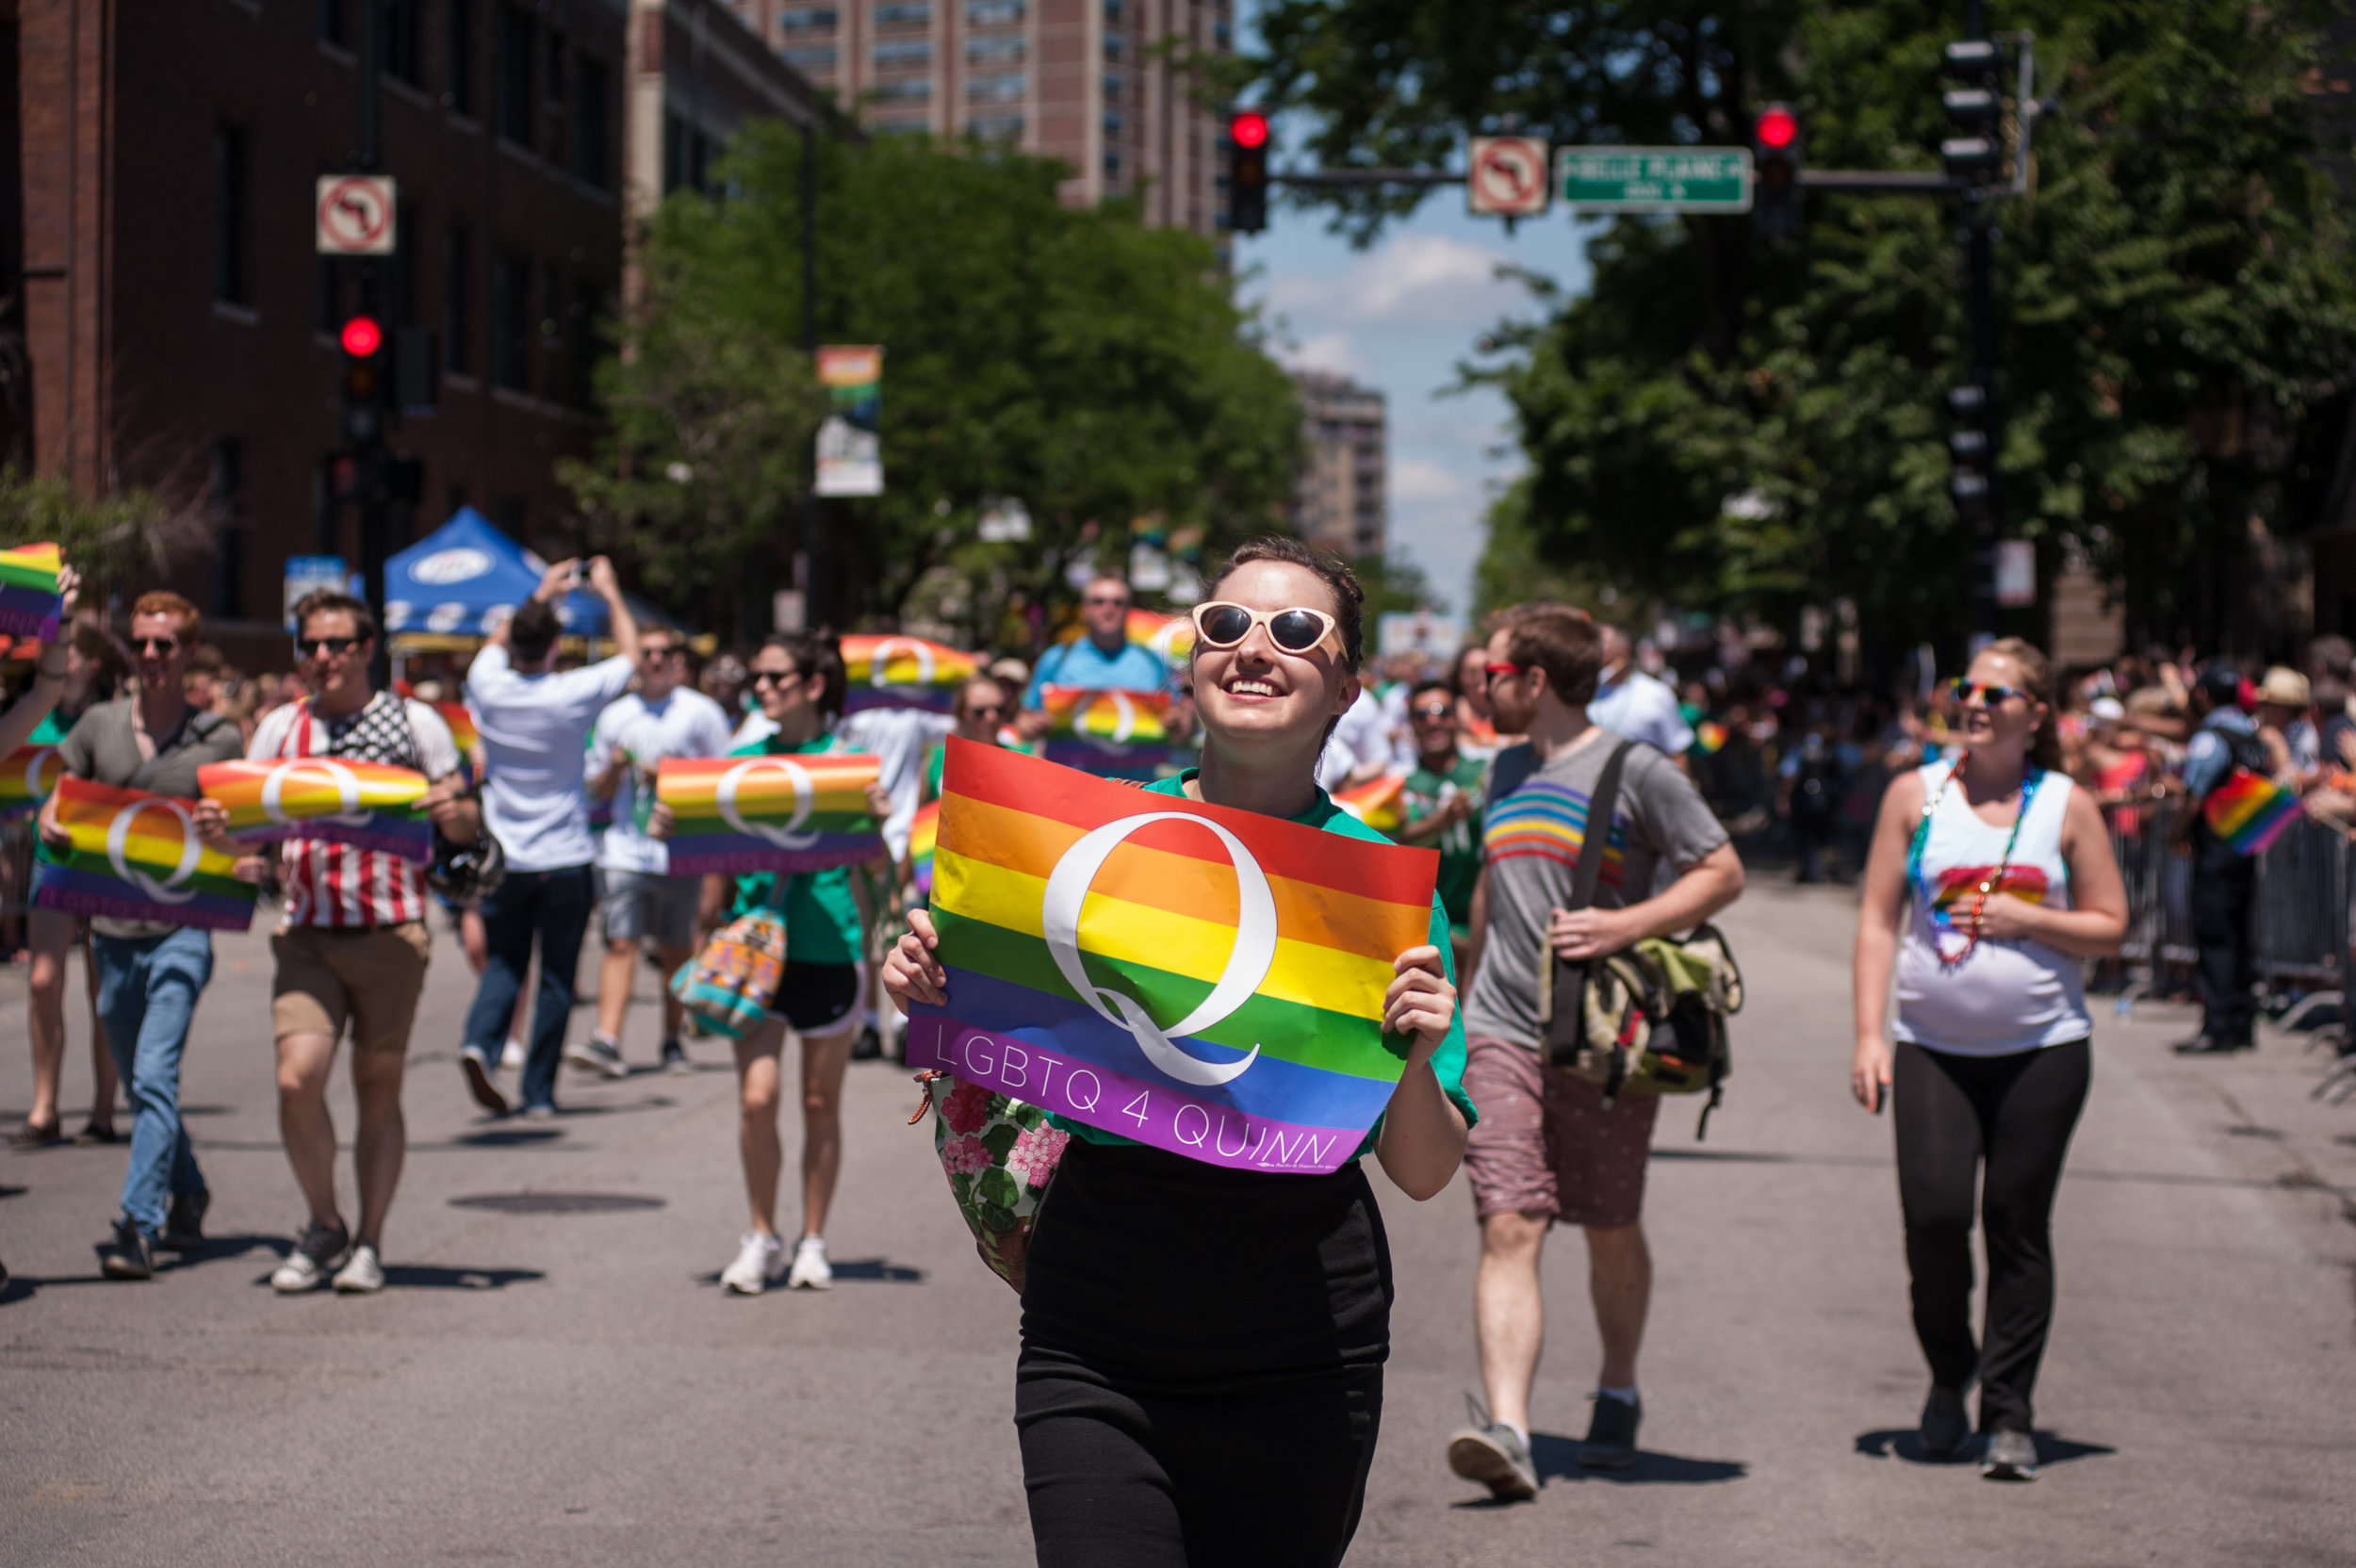 062914_Quinn_Pride_Parade_Chicago_IL_CD_0428.jpg